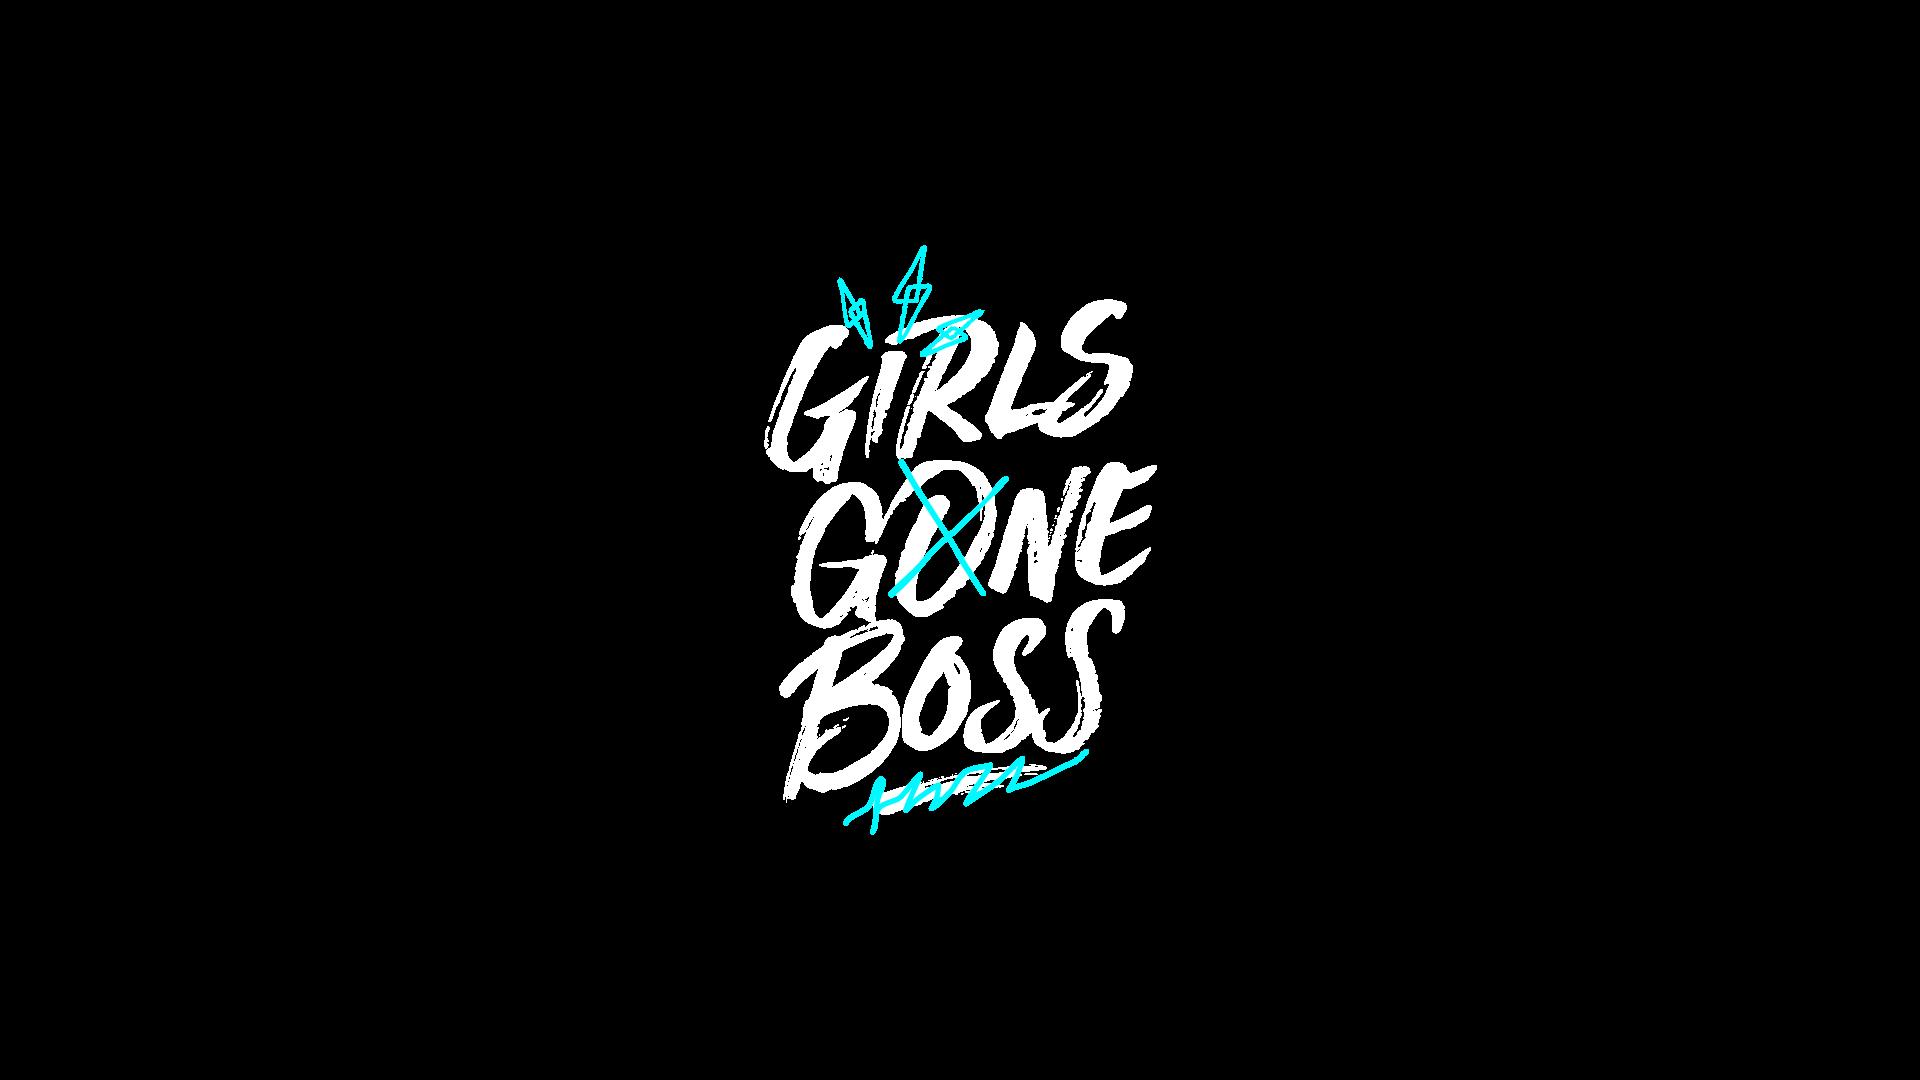 Ggb logo wht